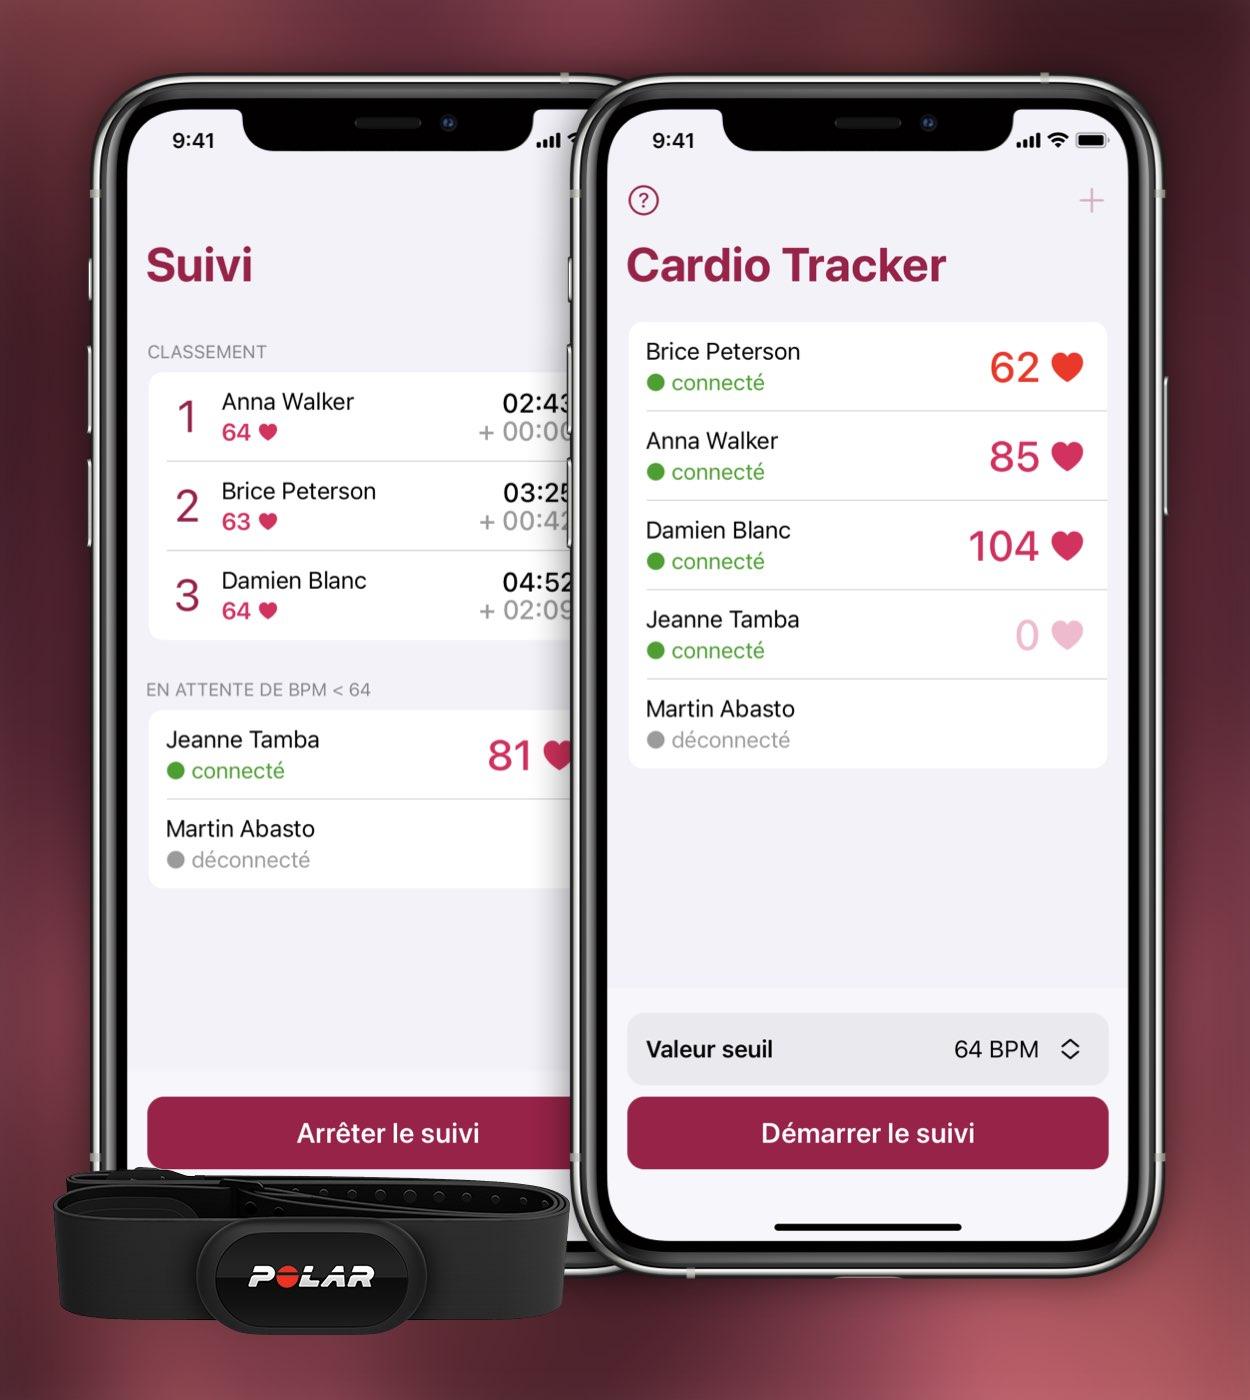 Cardio Tracker